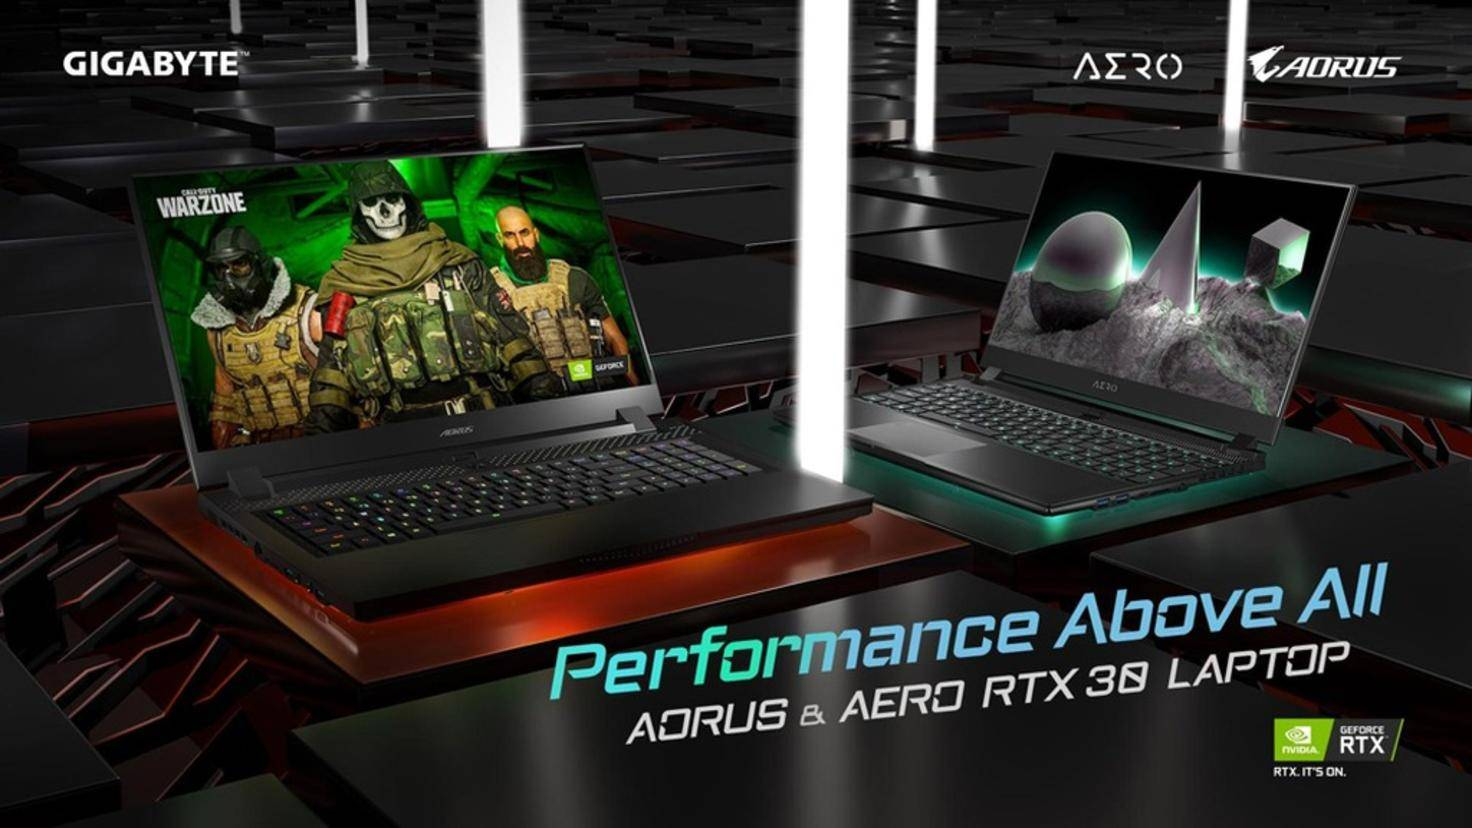 gigabyte_aorus_ces_2021